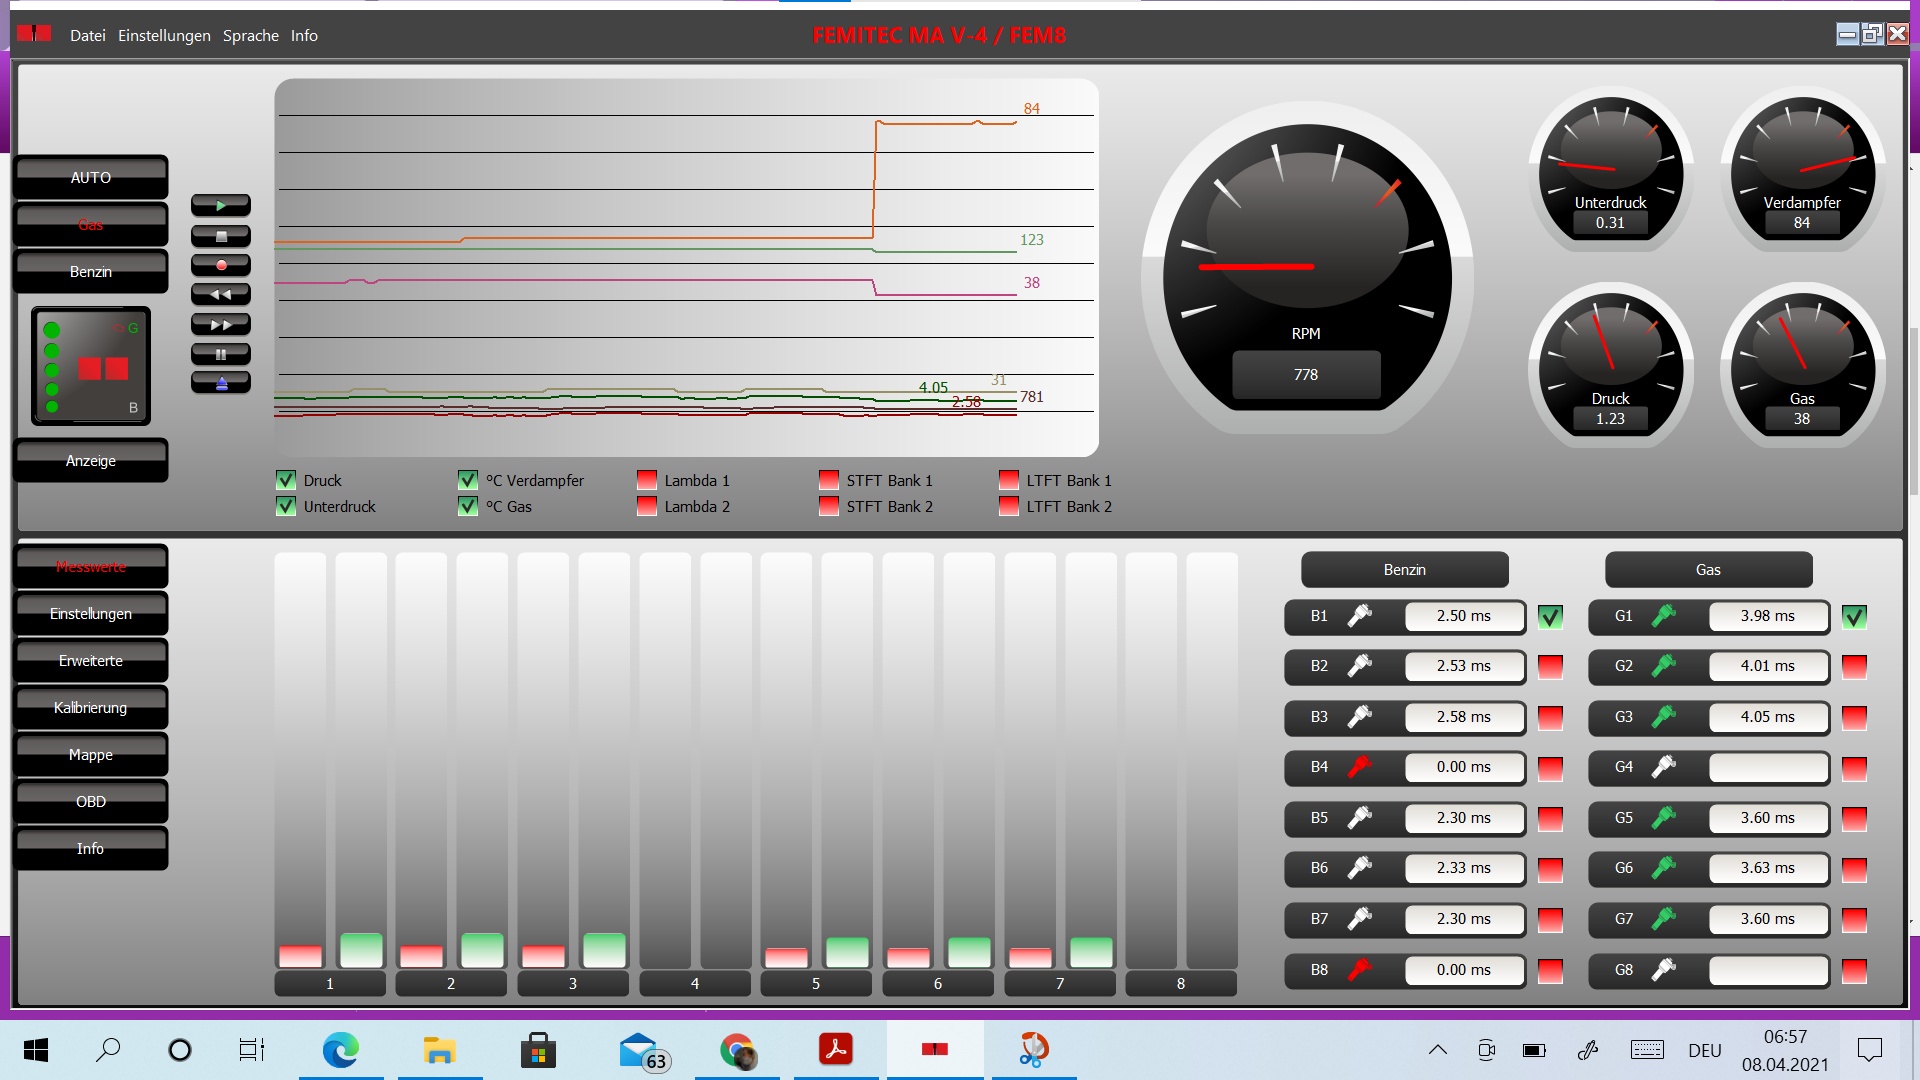 Screenshot 2021-04-08 080718.png